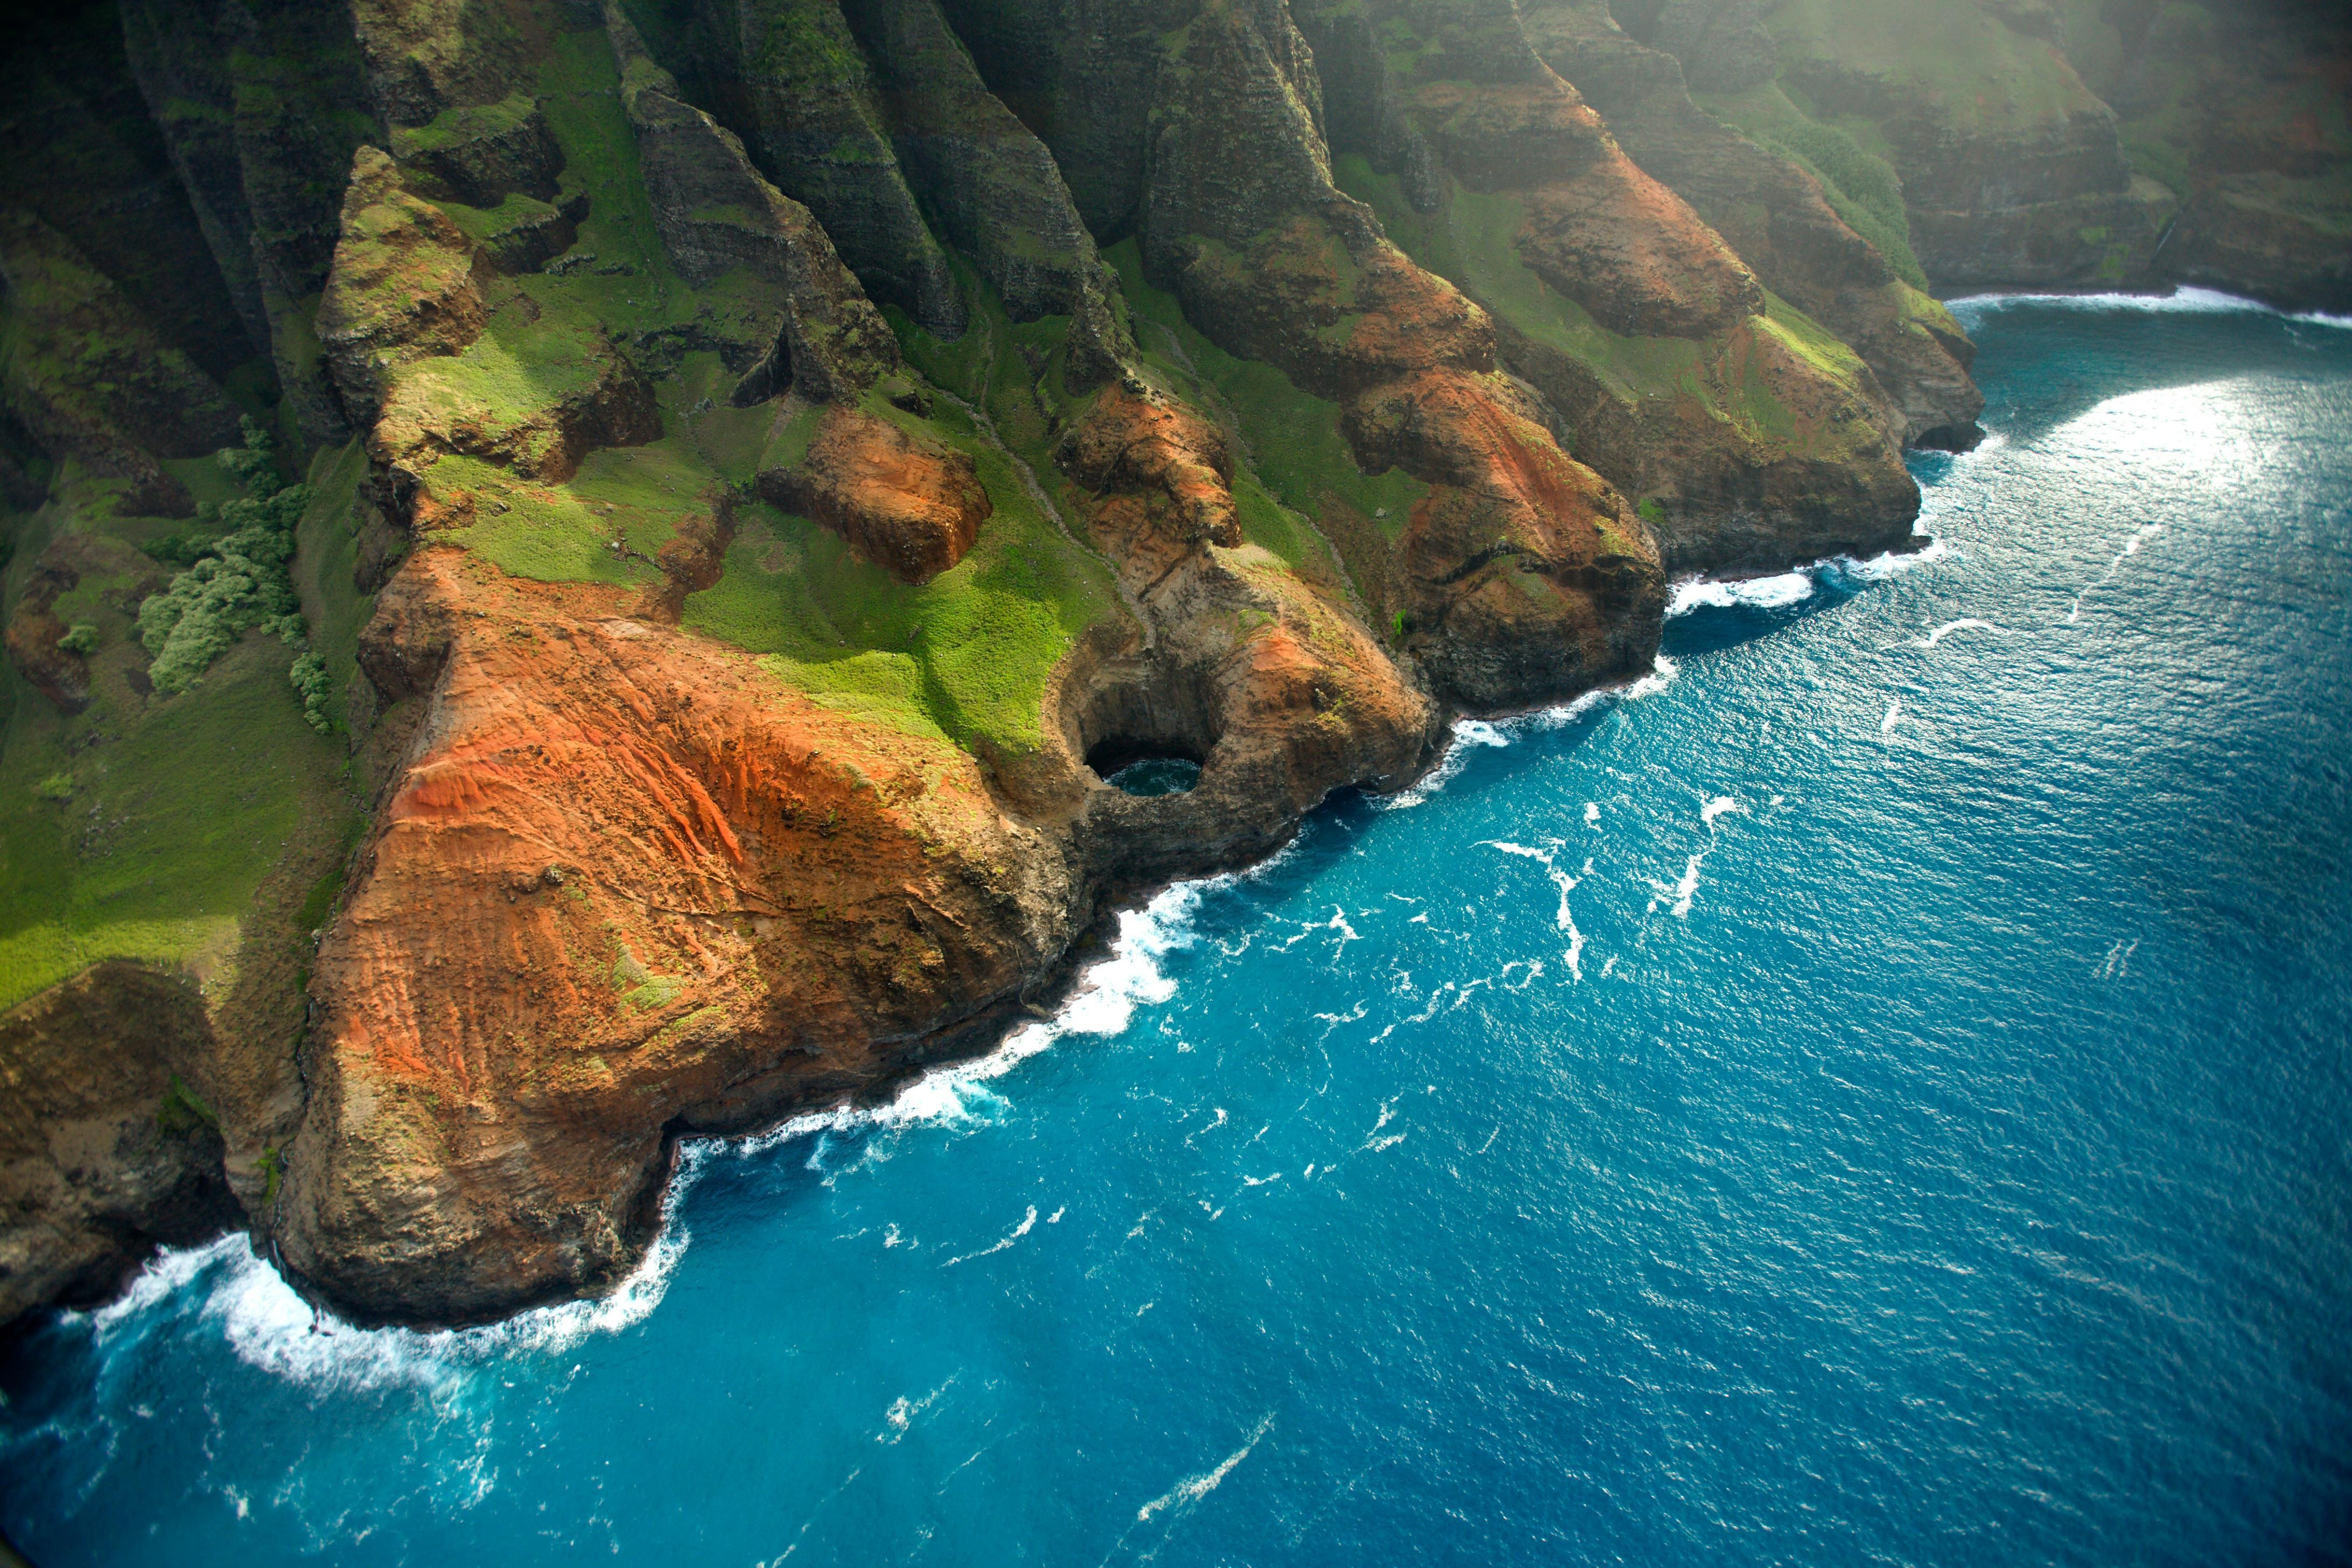 Kauai Day Trips from Oahu